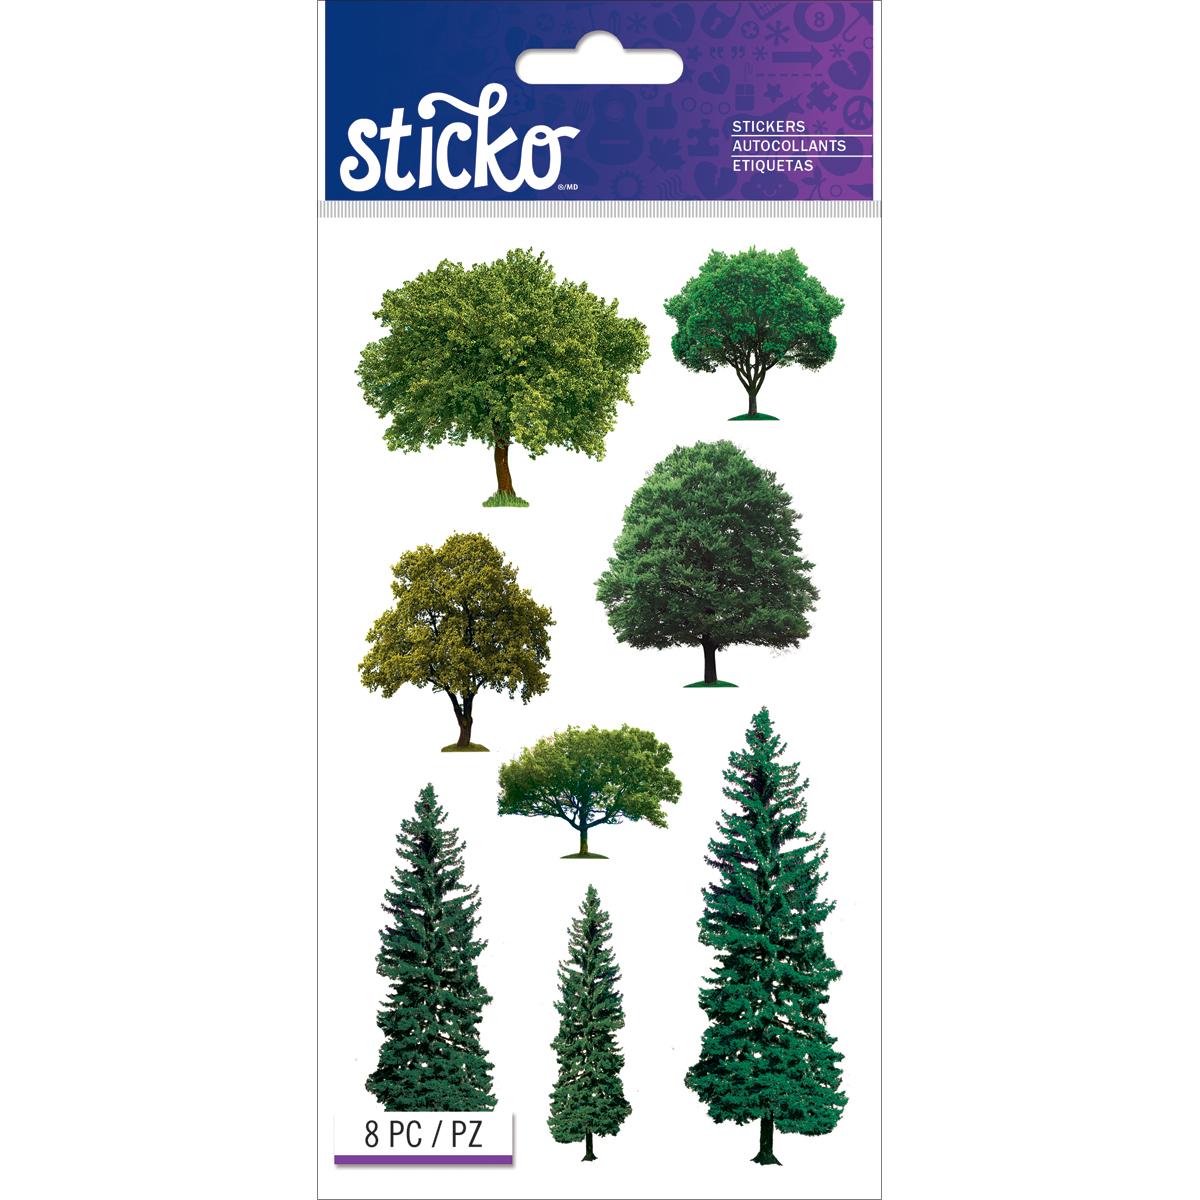 TREES     -STICKO CLASSC STICKR